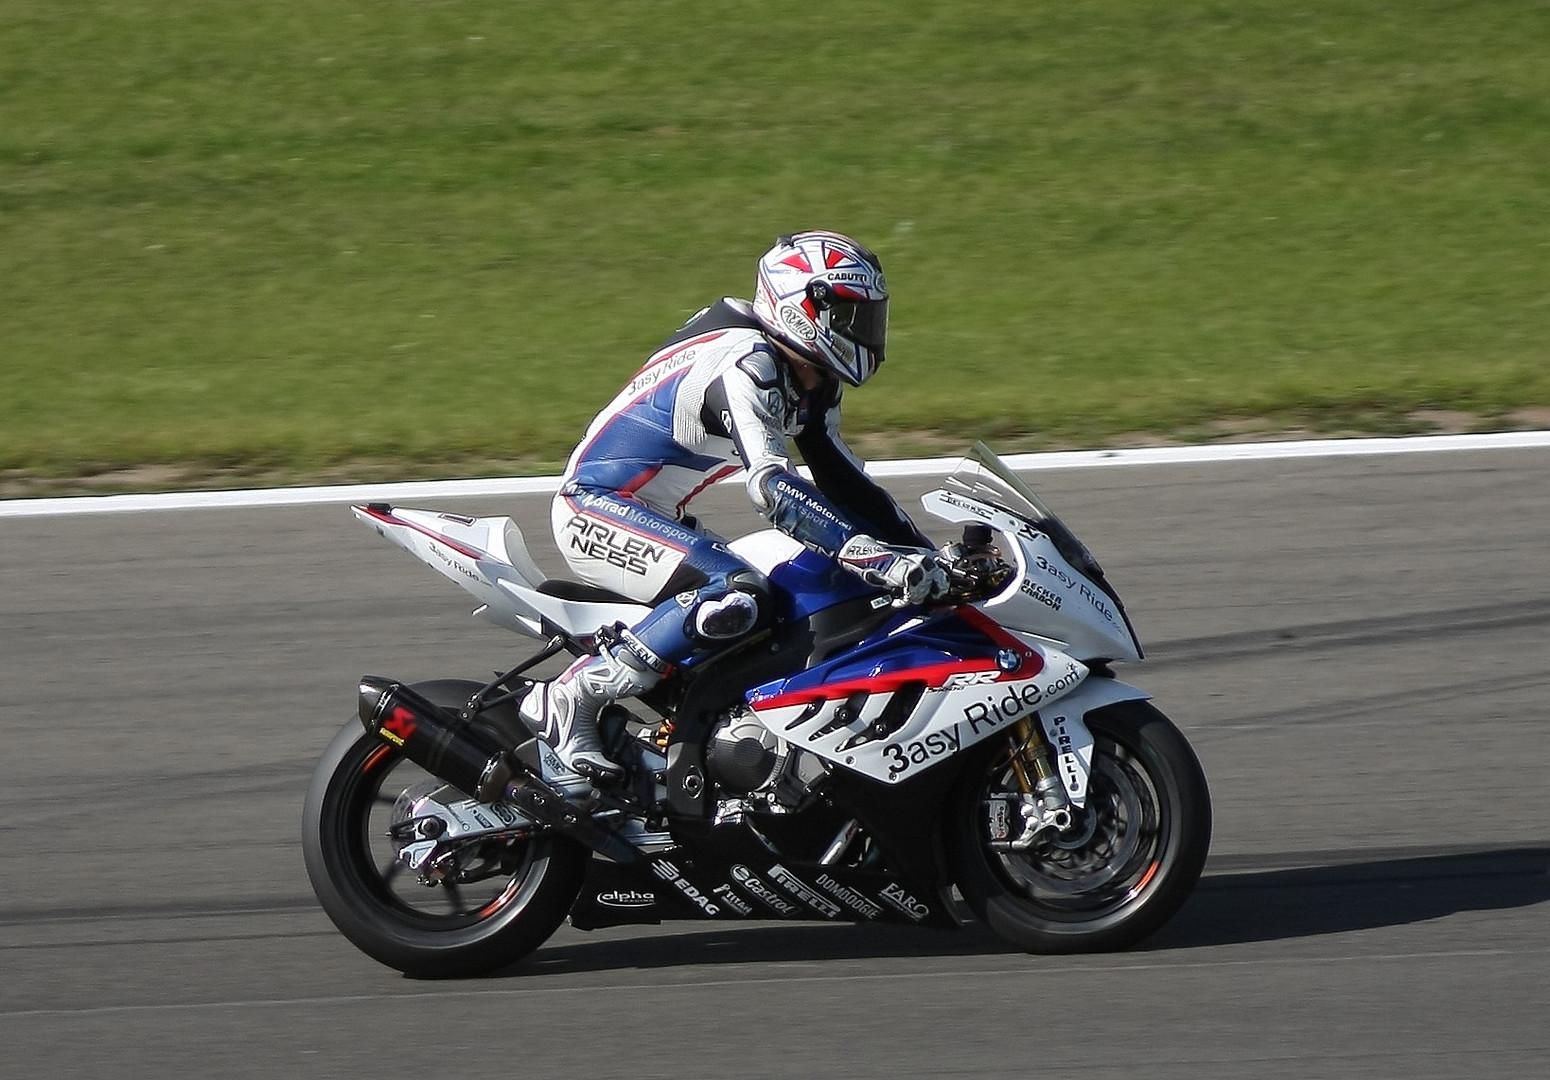 SBK 2010 Nürburgring